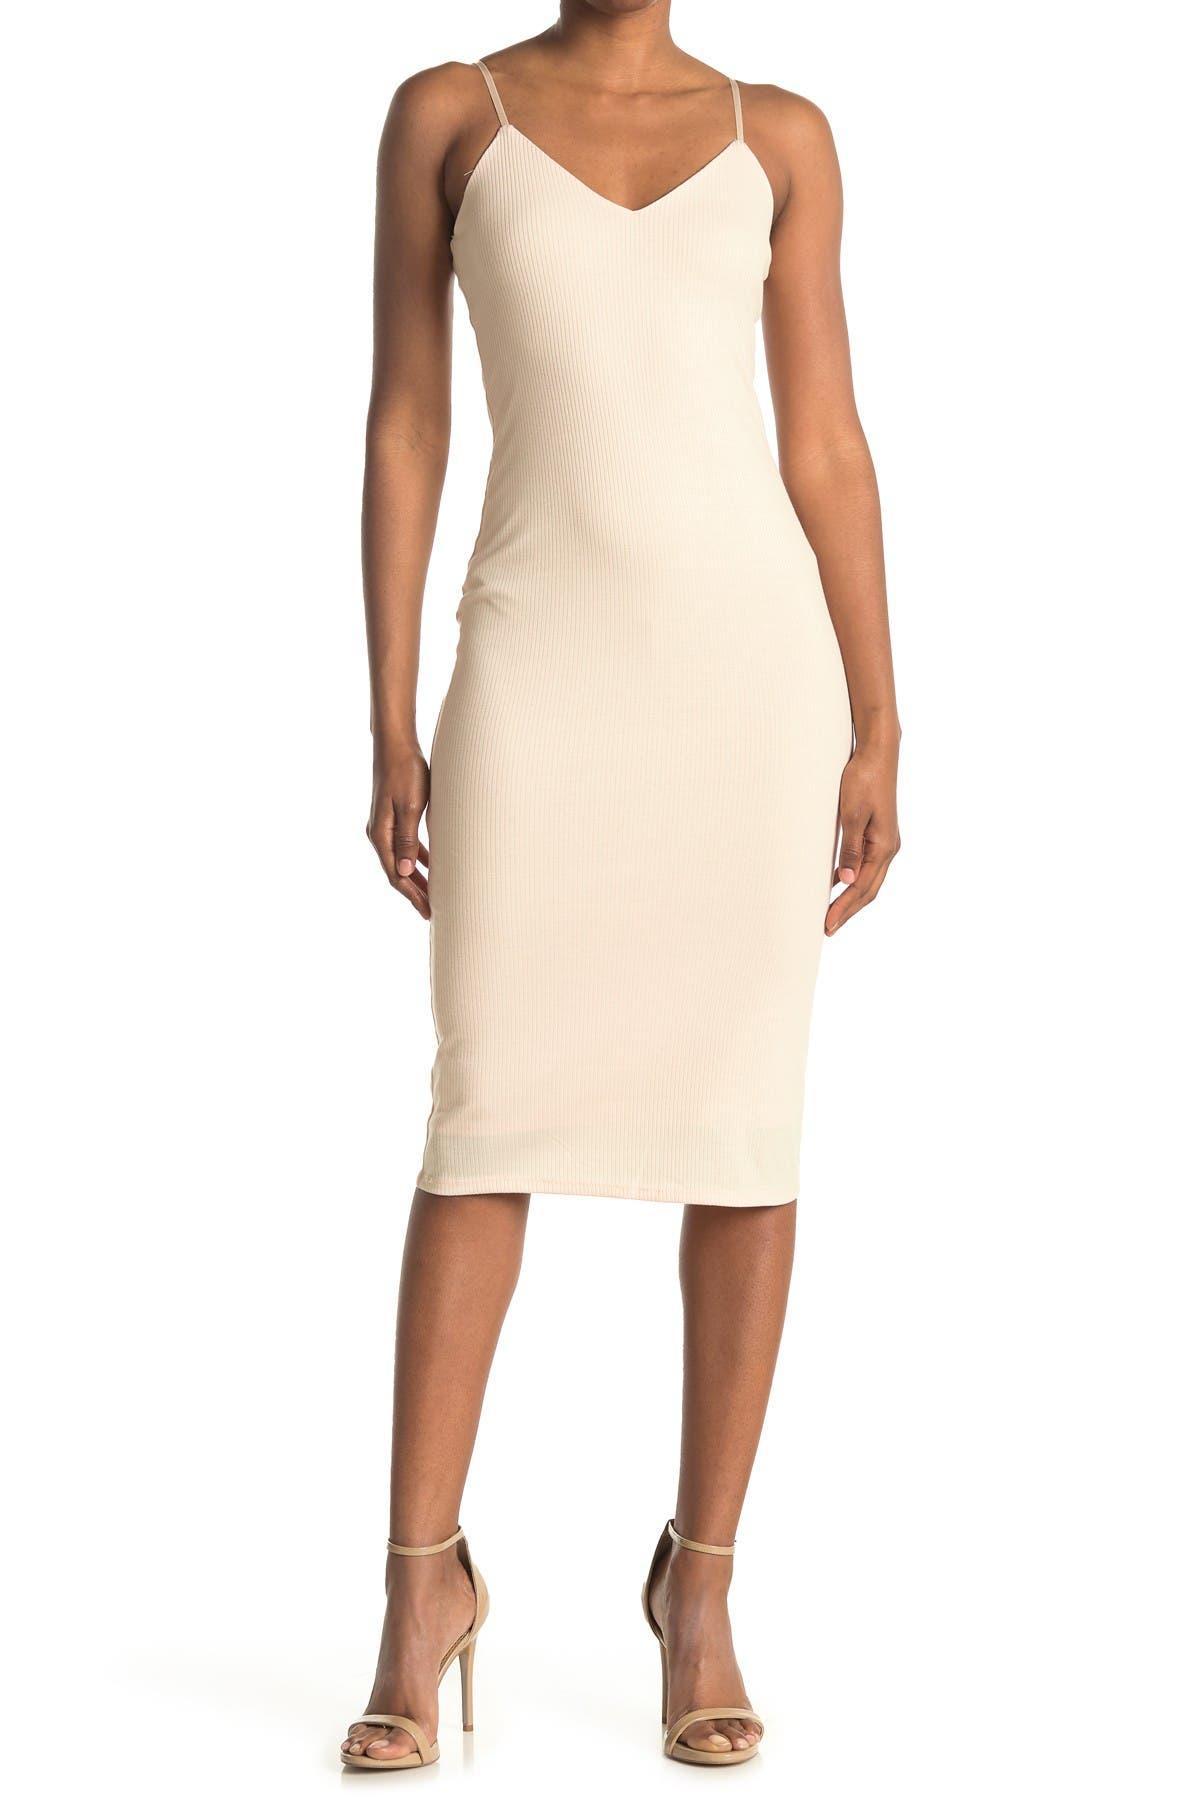 Image of AFRM Fauna Ribbed Midi Dress